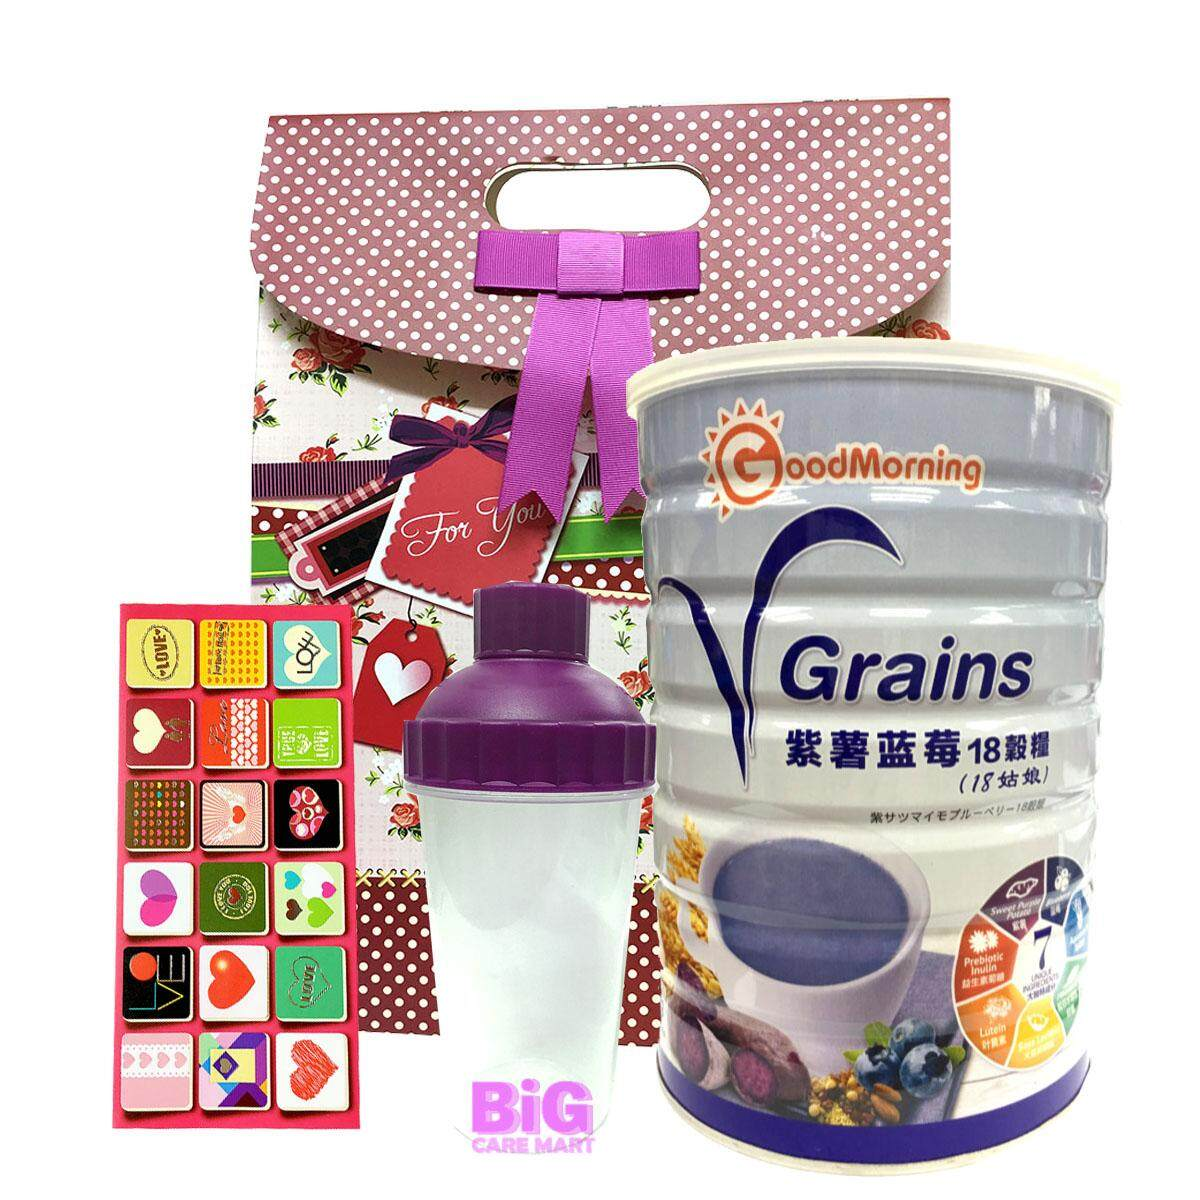 Mother's Day Good Morning VGrains 18 Grains 1kg (Bag+Shaker+Card)